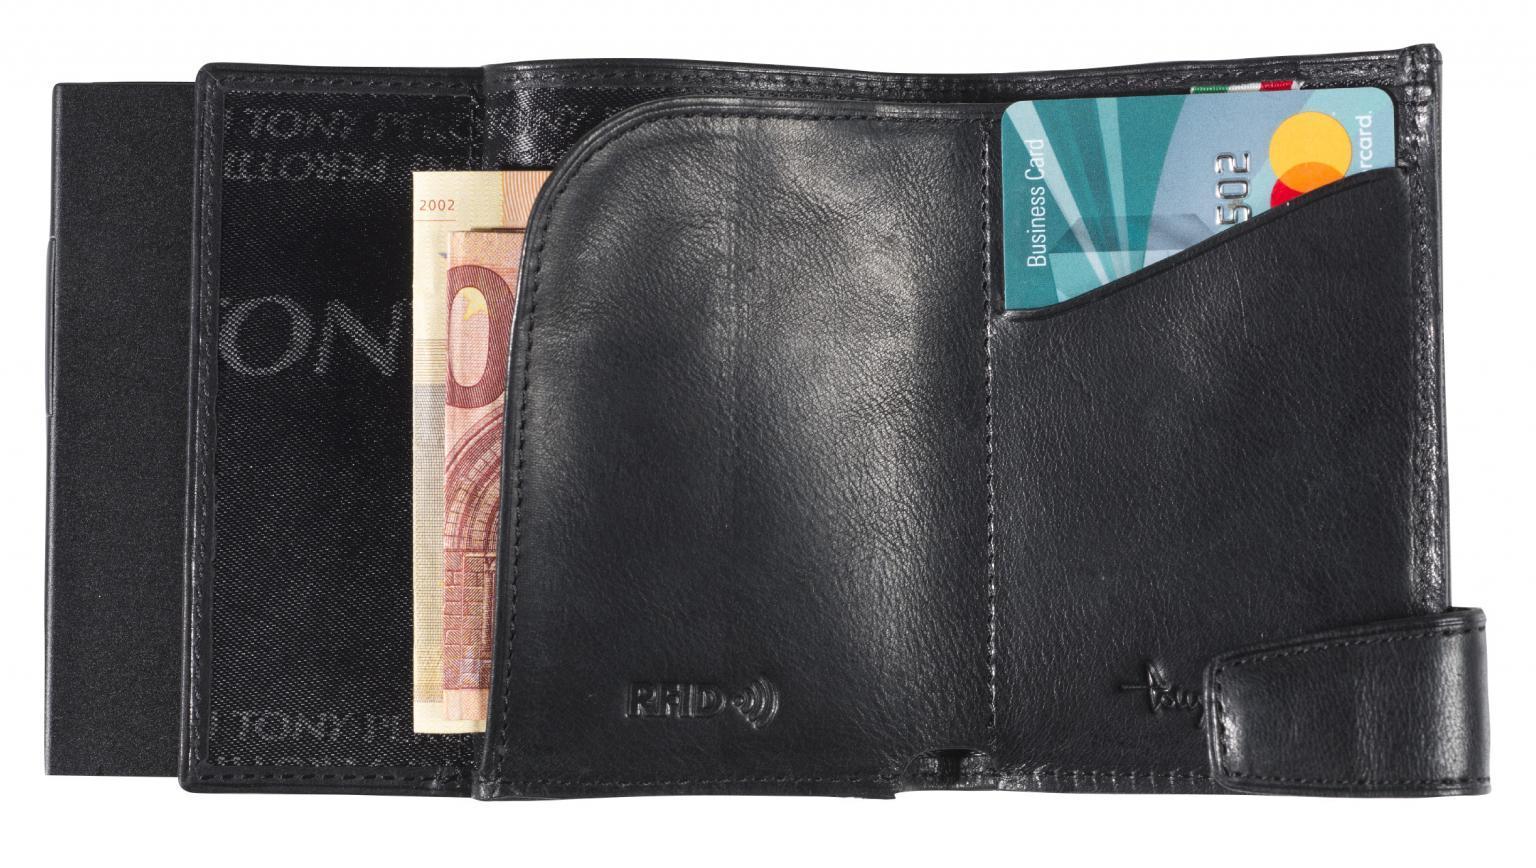 Tony Perotti Kreditkartenetui Carbon schwarz Ausleseschutz